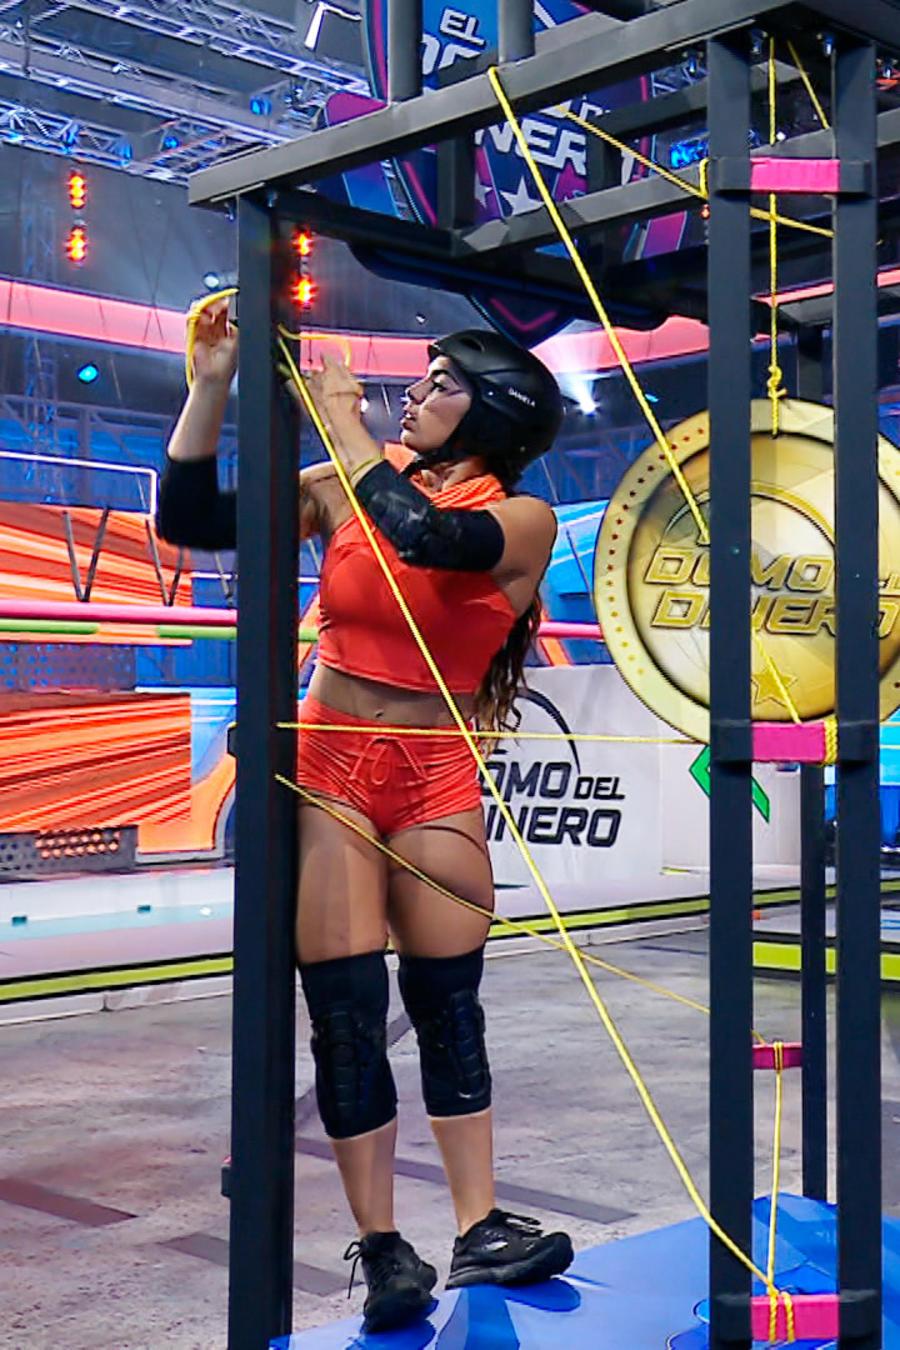 Circuito Veloz, episodio 7, El Domo del Dinero, Daniela vs Metzli